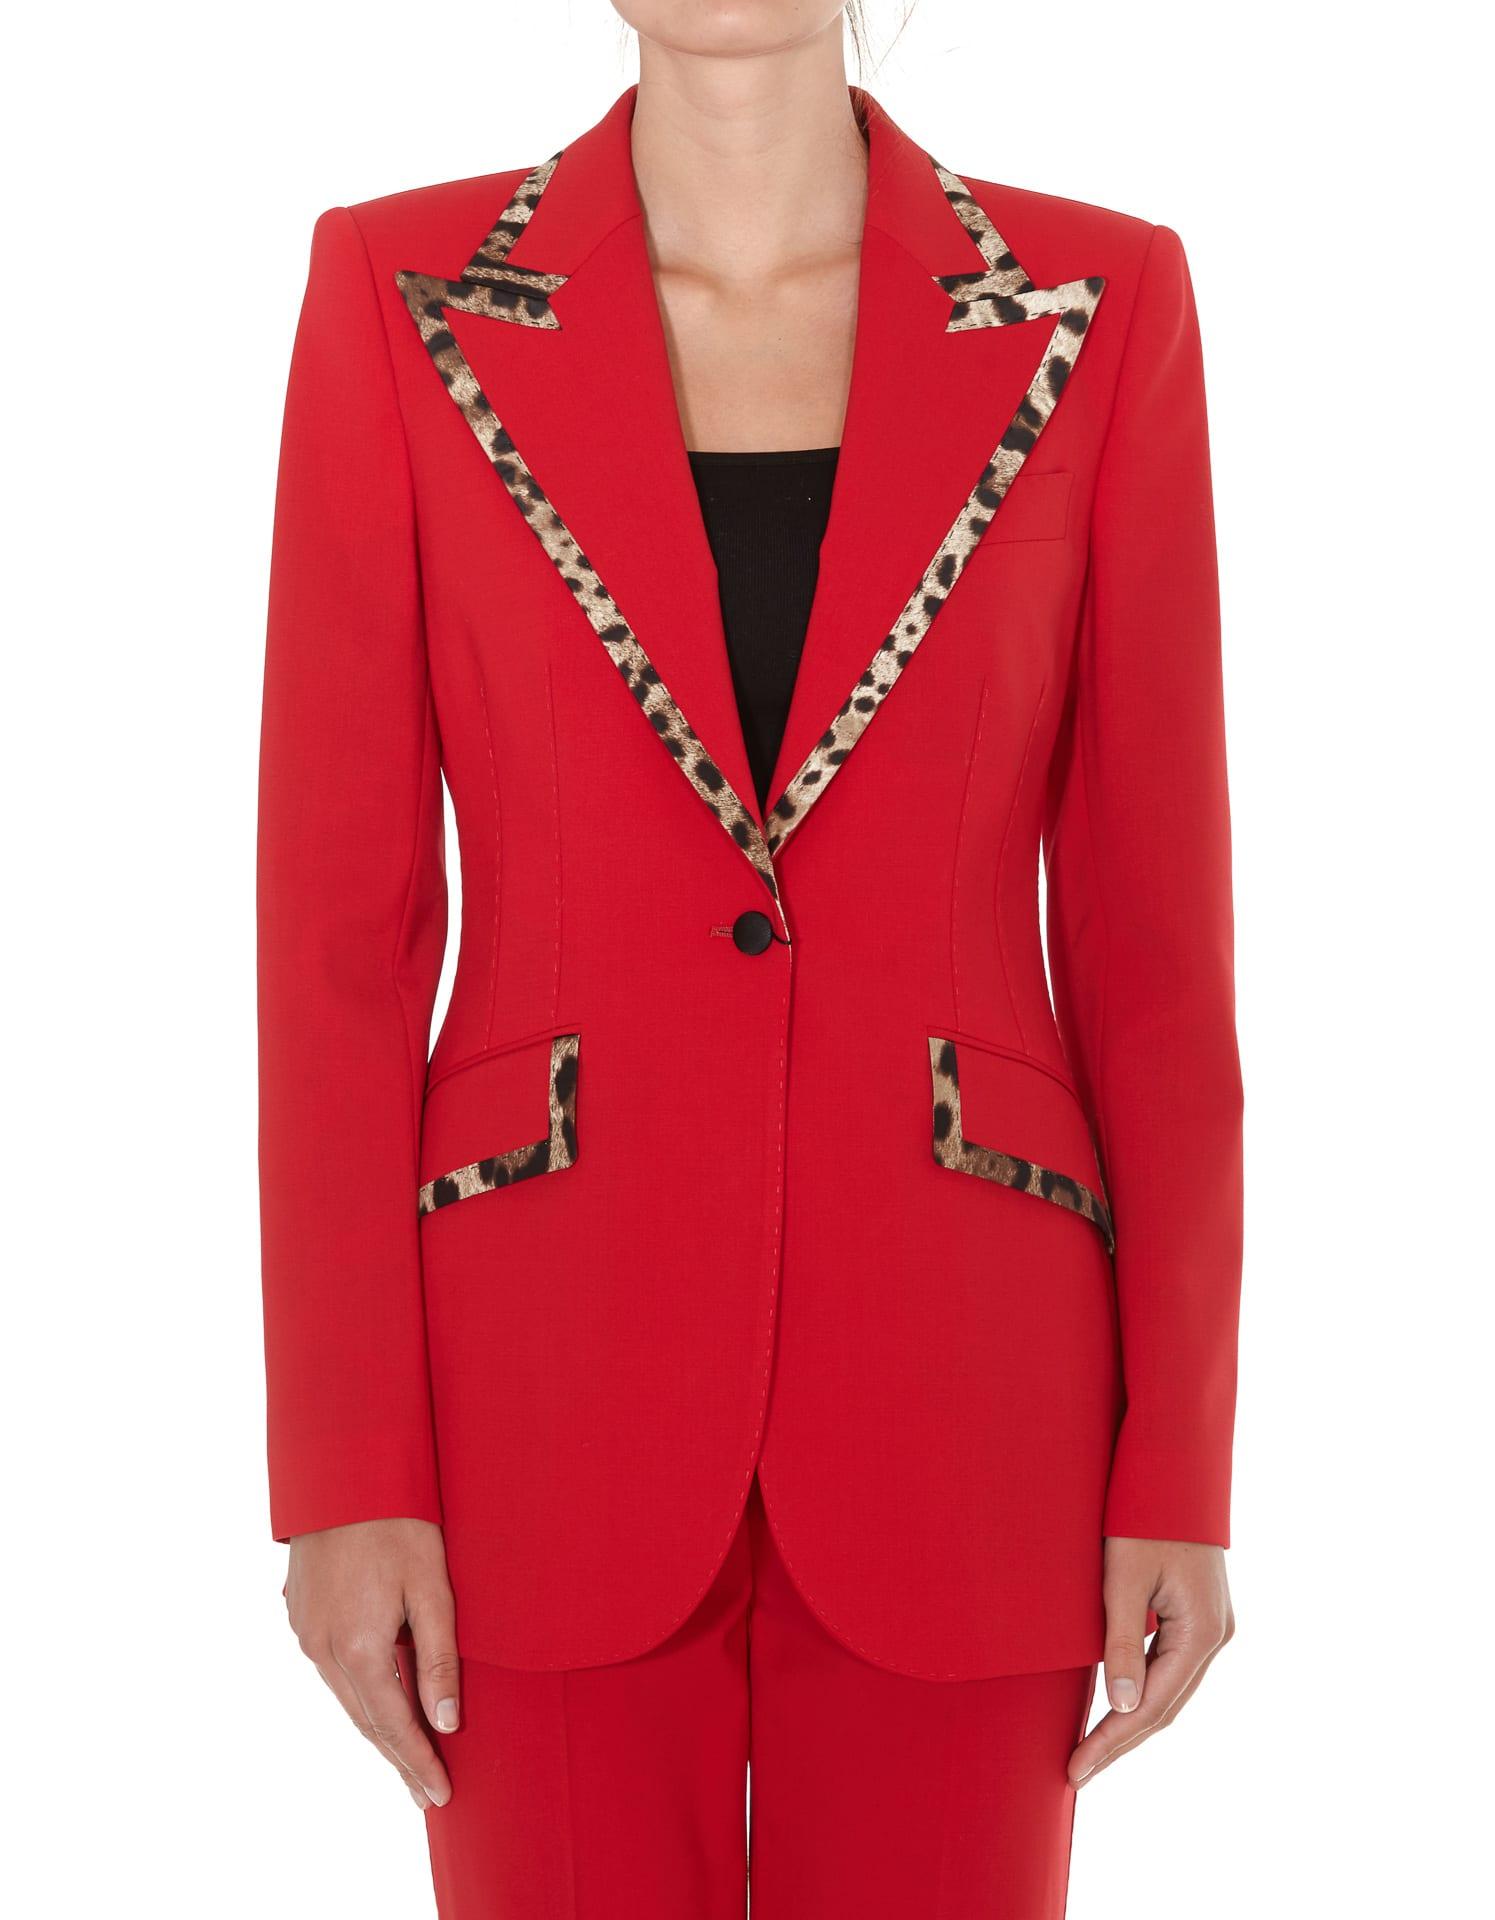 Dolce & Gabbana Blazer With Leopard Print Detail